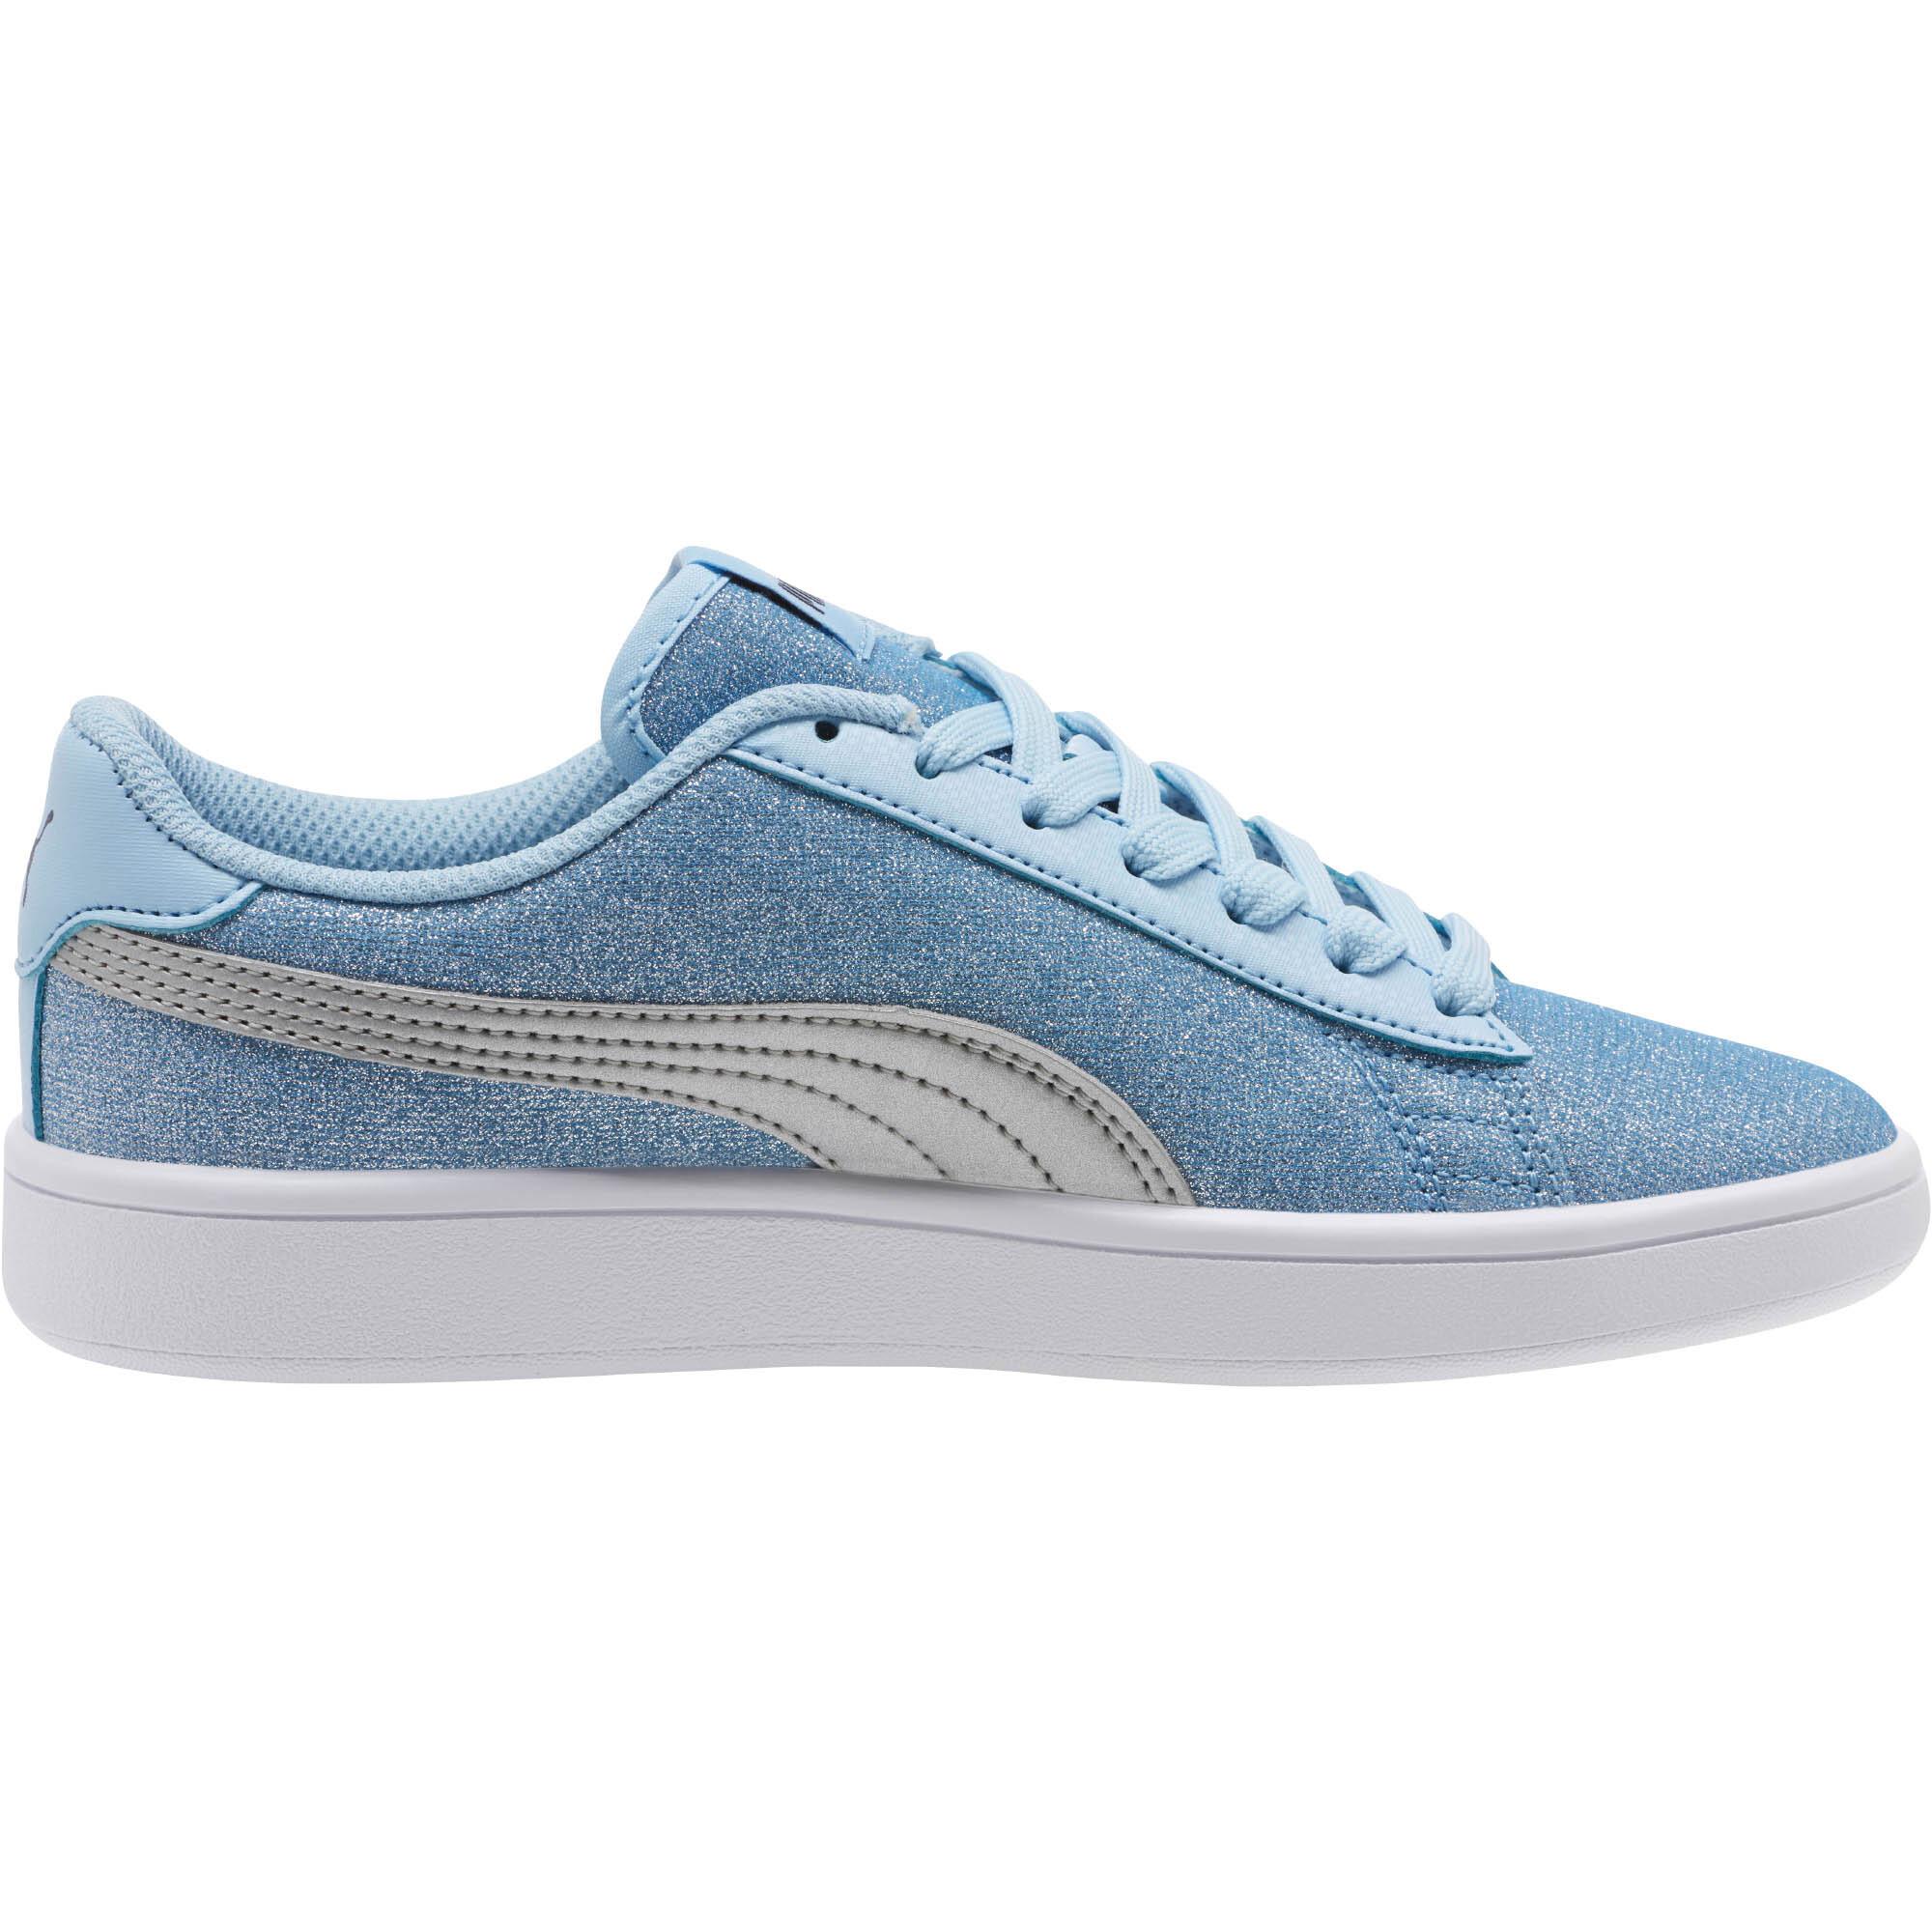 PUMA-Smash-v2-Glitz-Glam-Sneakers-JR-Girls-Shoe-Kids thumbnail 5